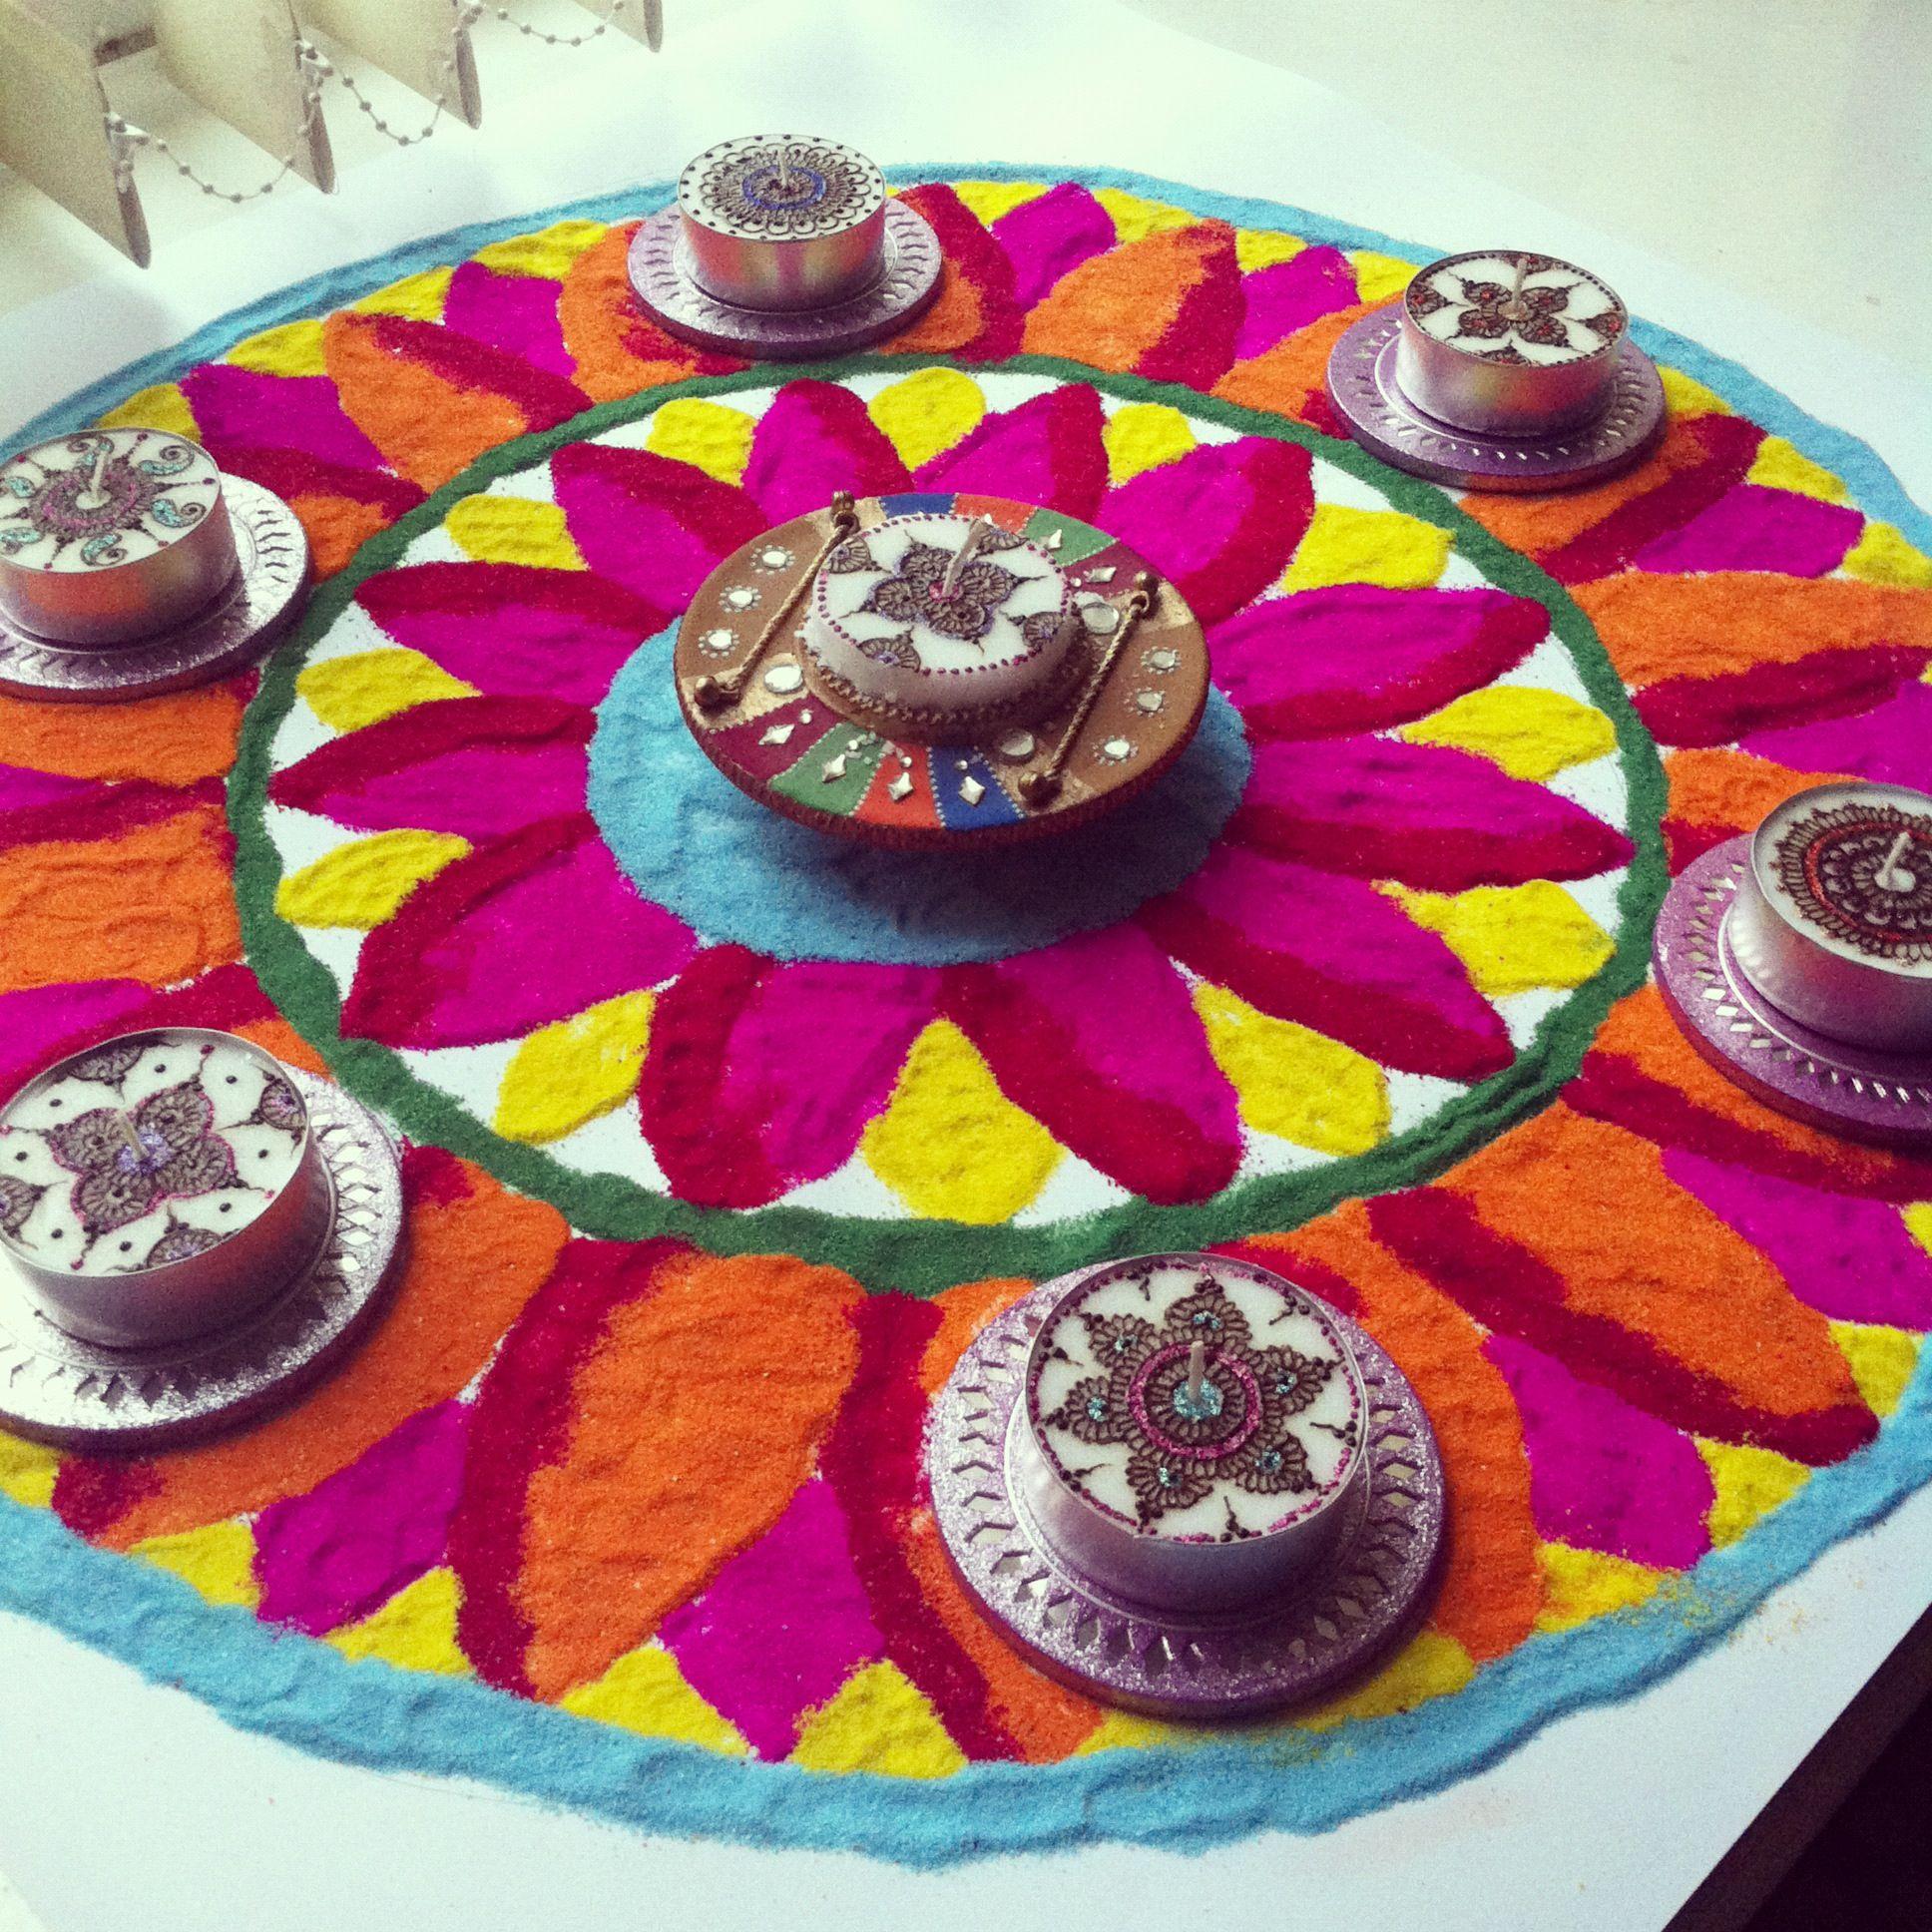 Rose petals n flowers.. Flower rangoli, Rangoli designs